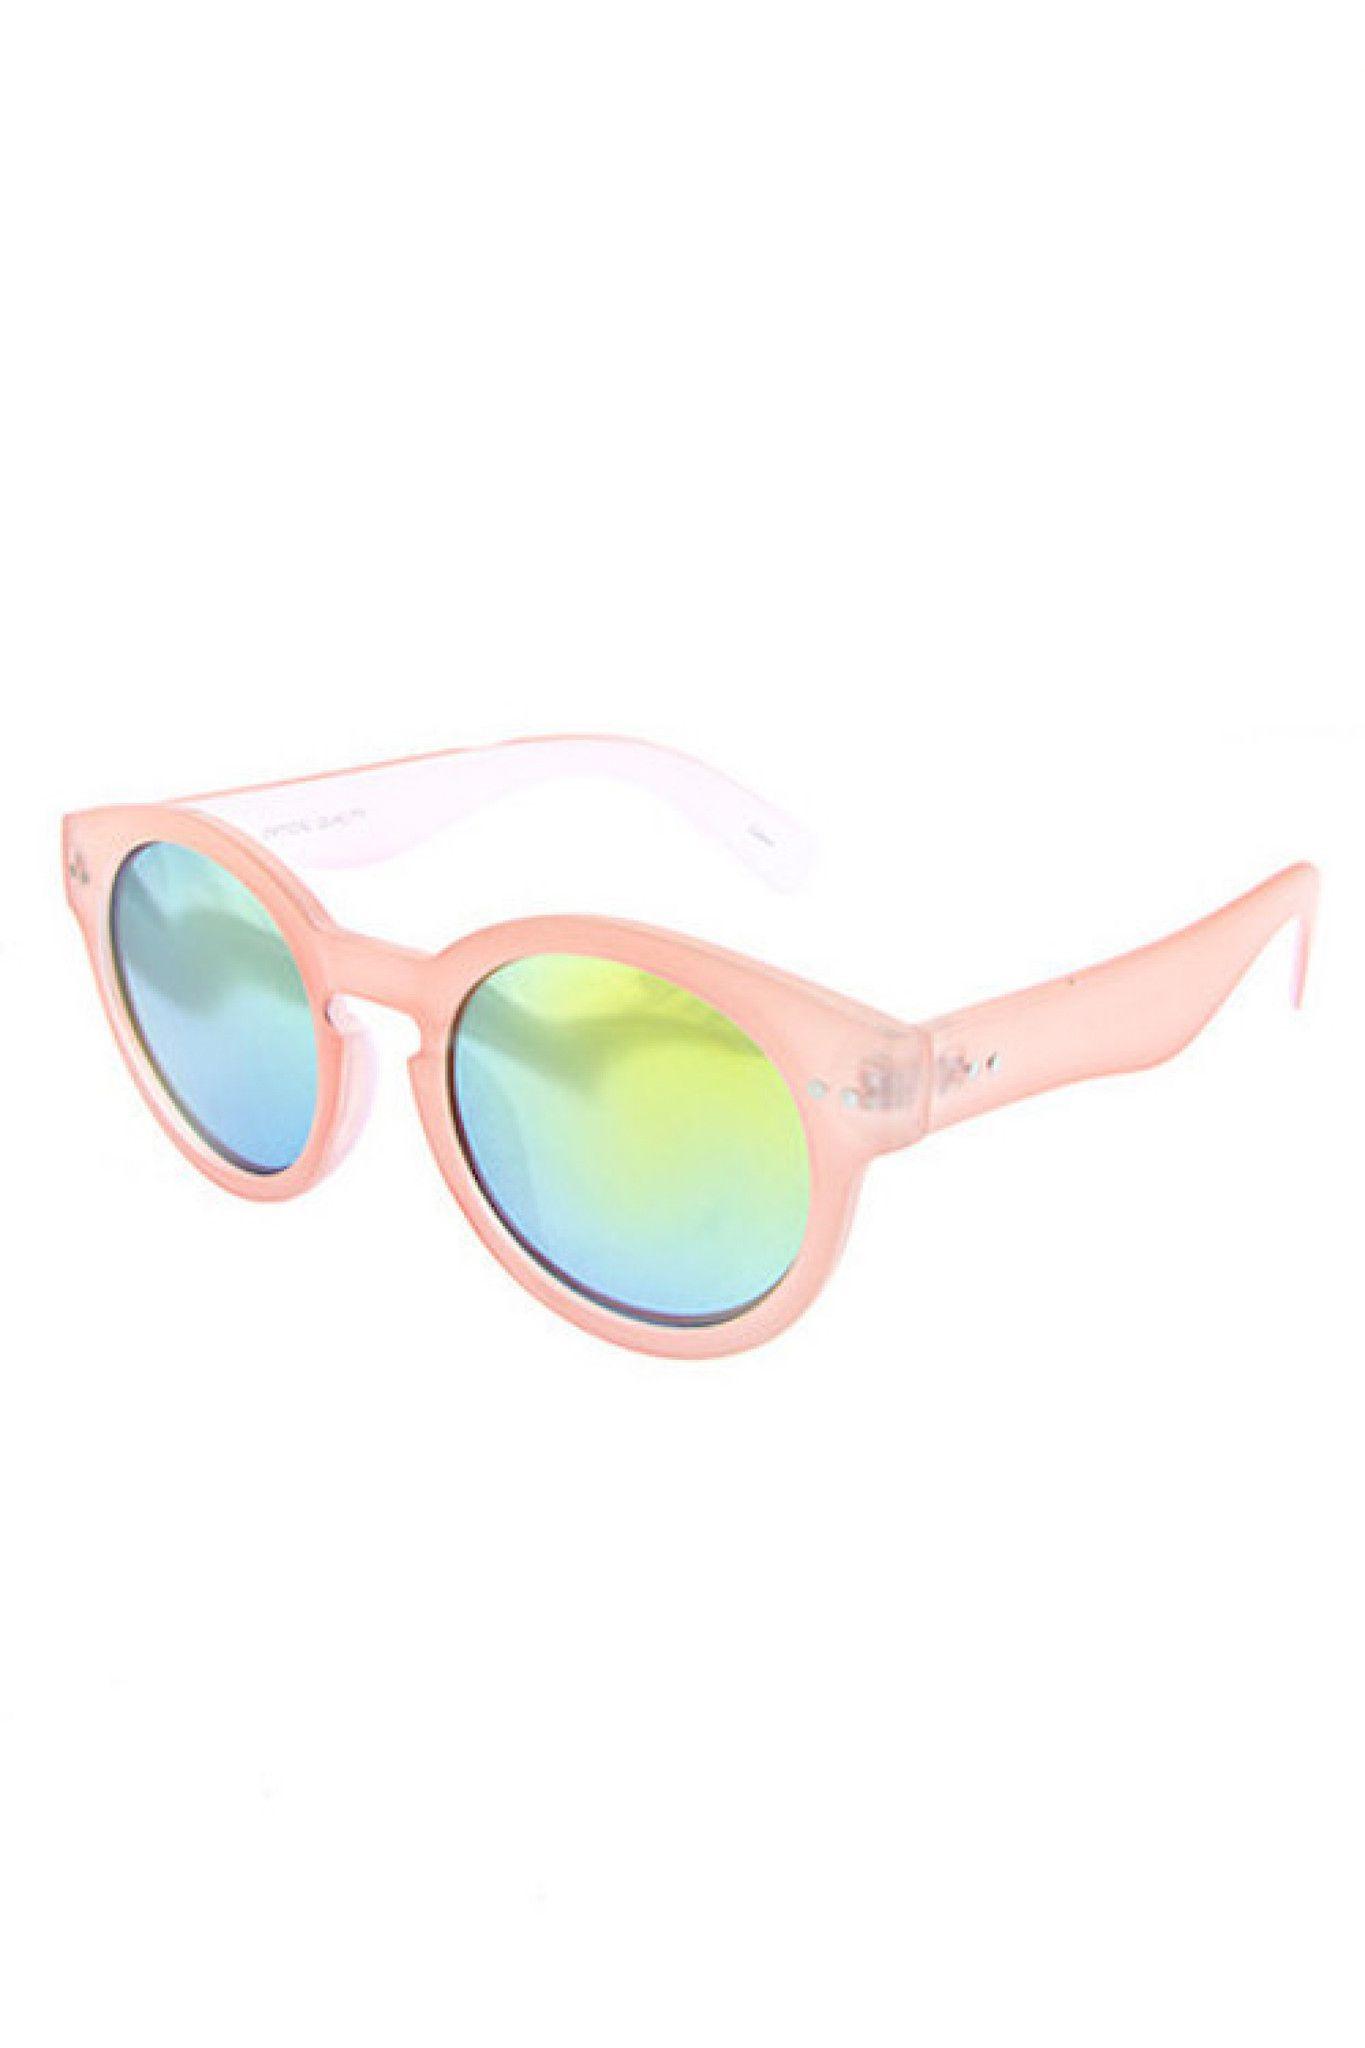 fruit colors sunglasses in five colors lens round sunglasses